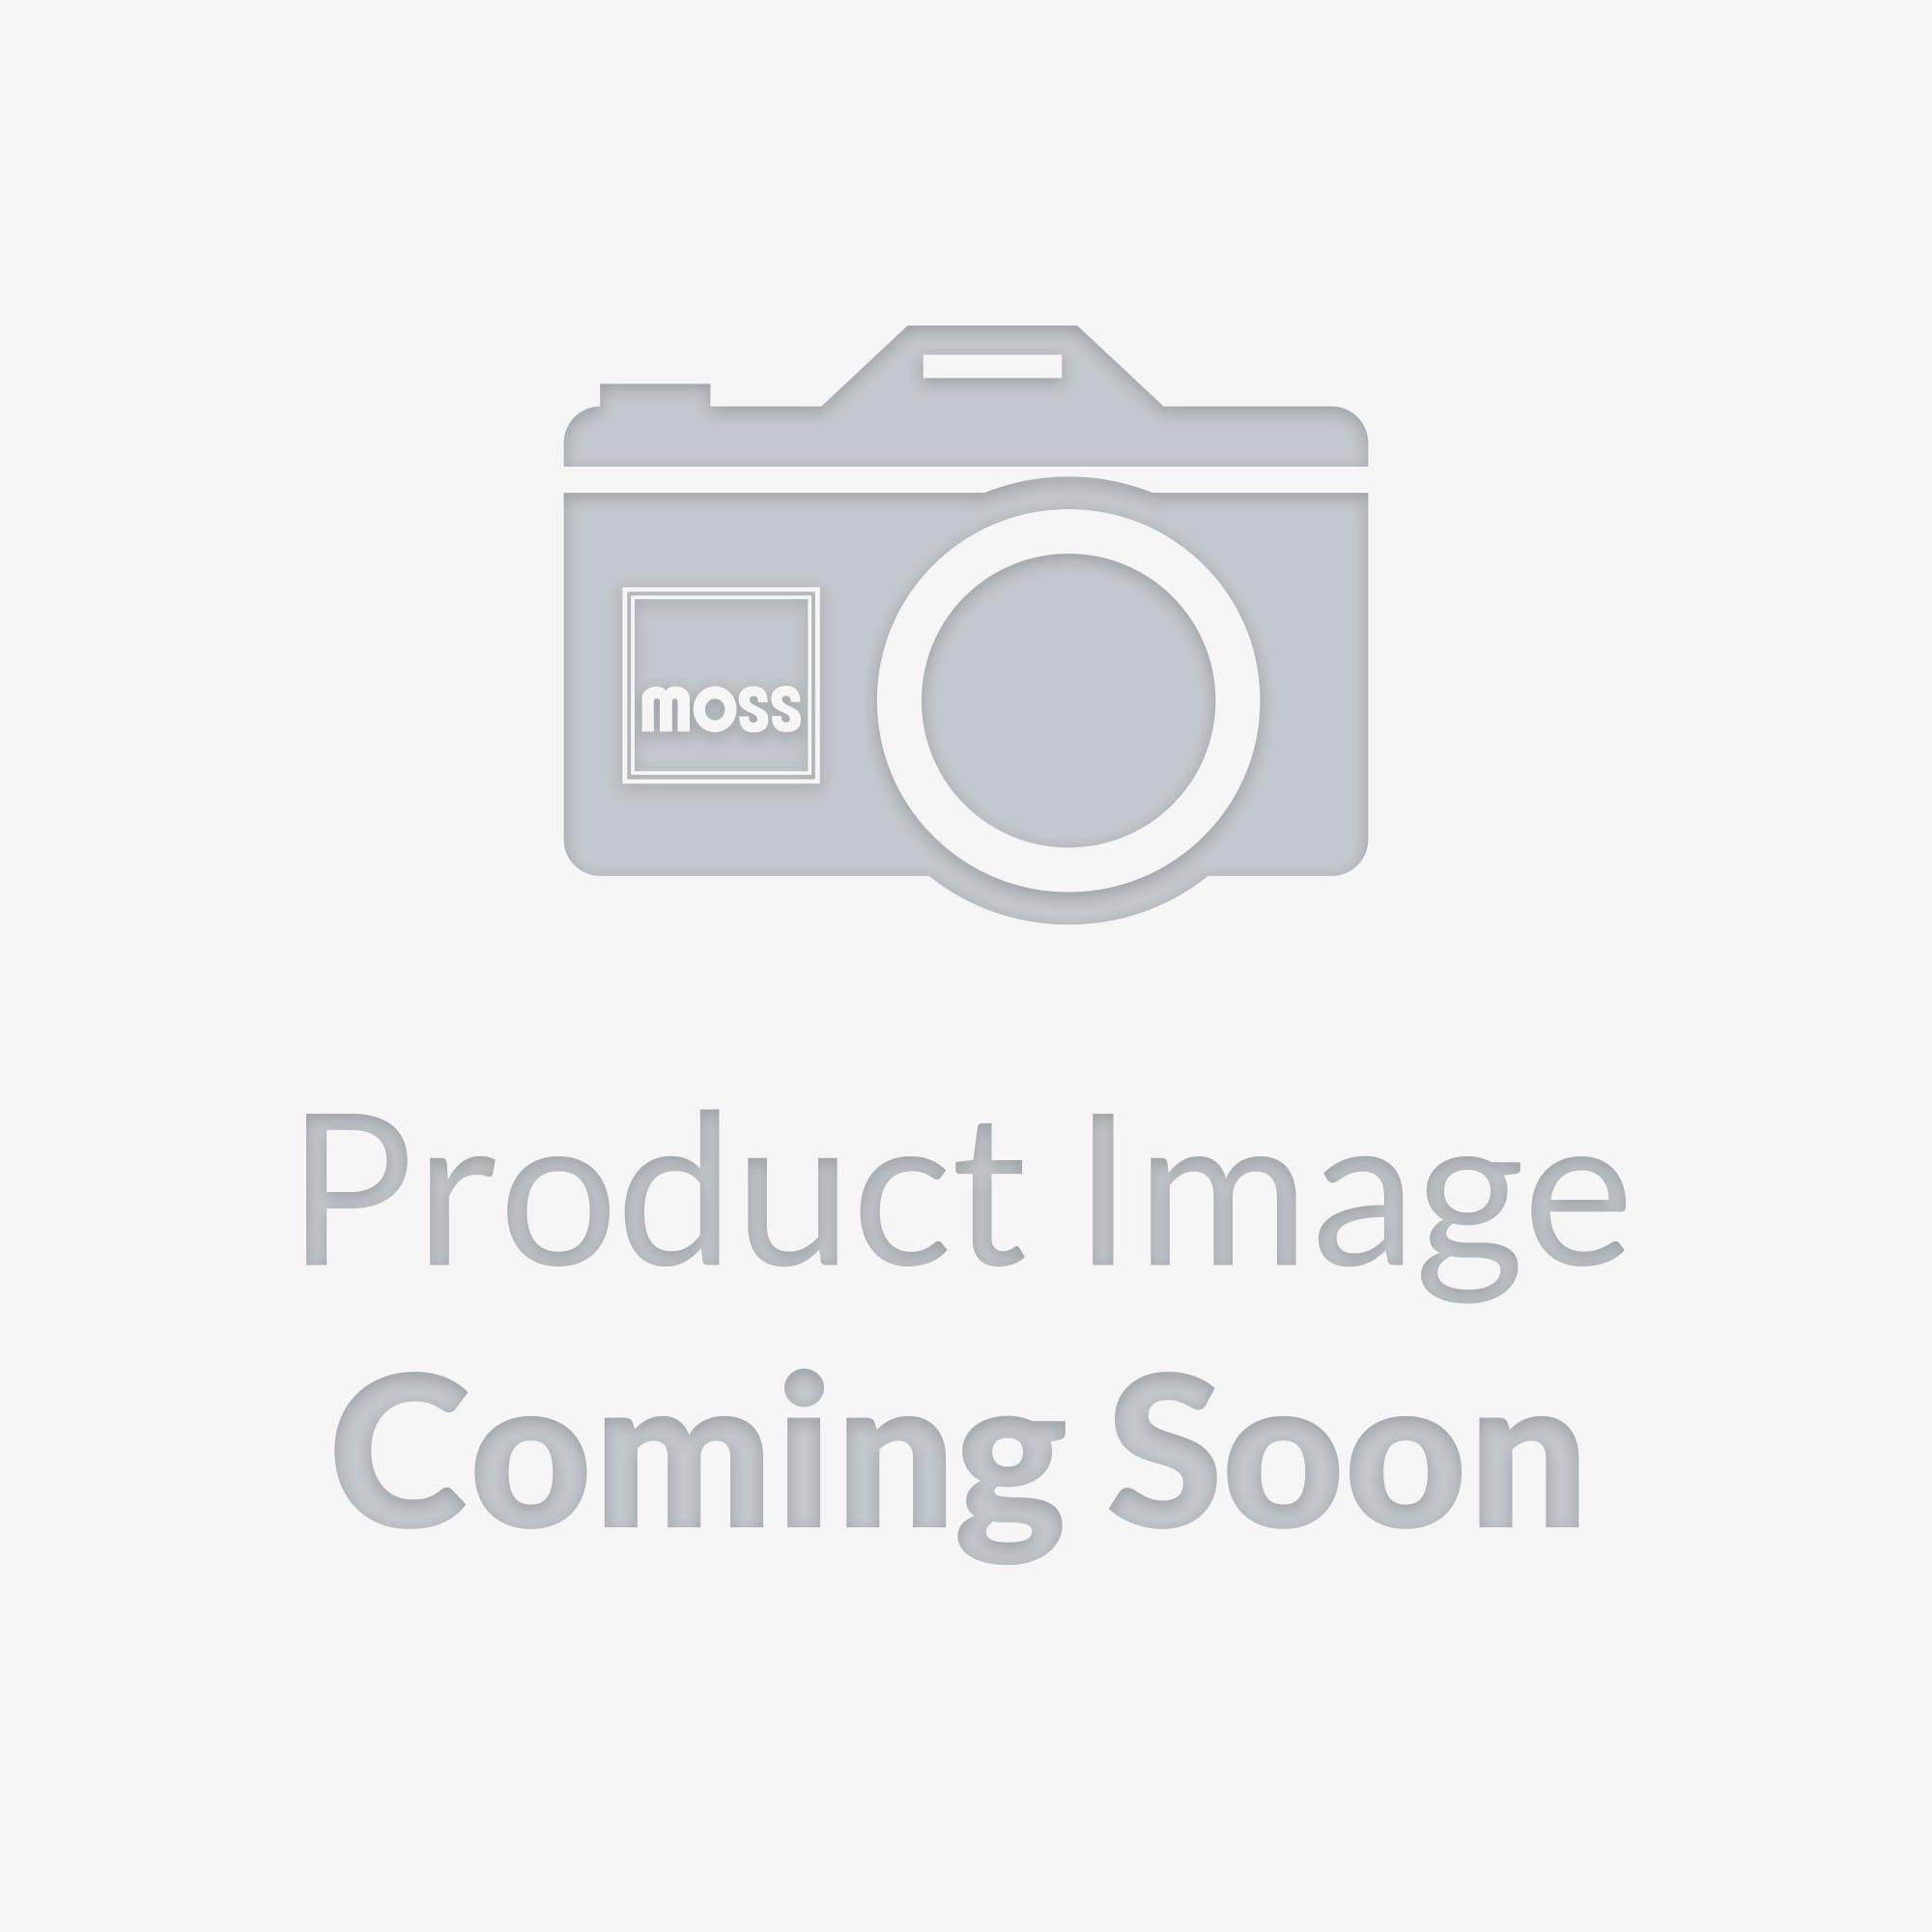 Mgb Wiring Diagram Color Also 1976 Triumph Tr7 Wiring Diagrams Also